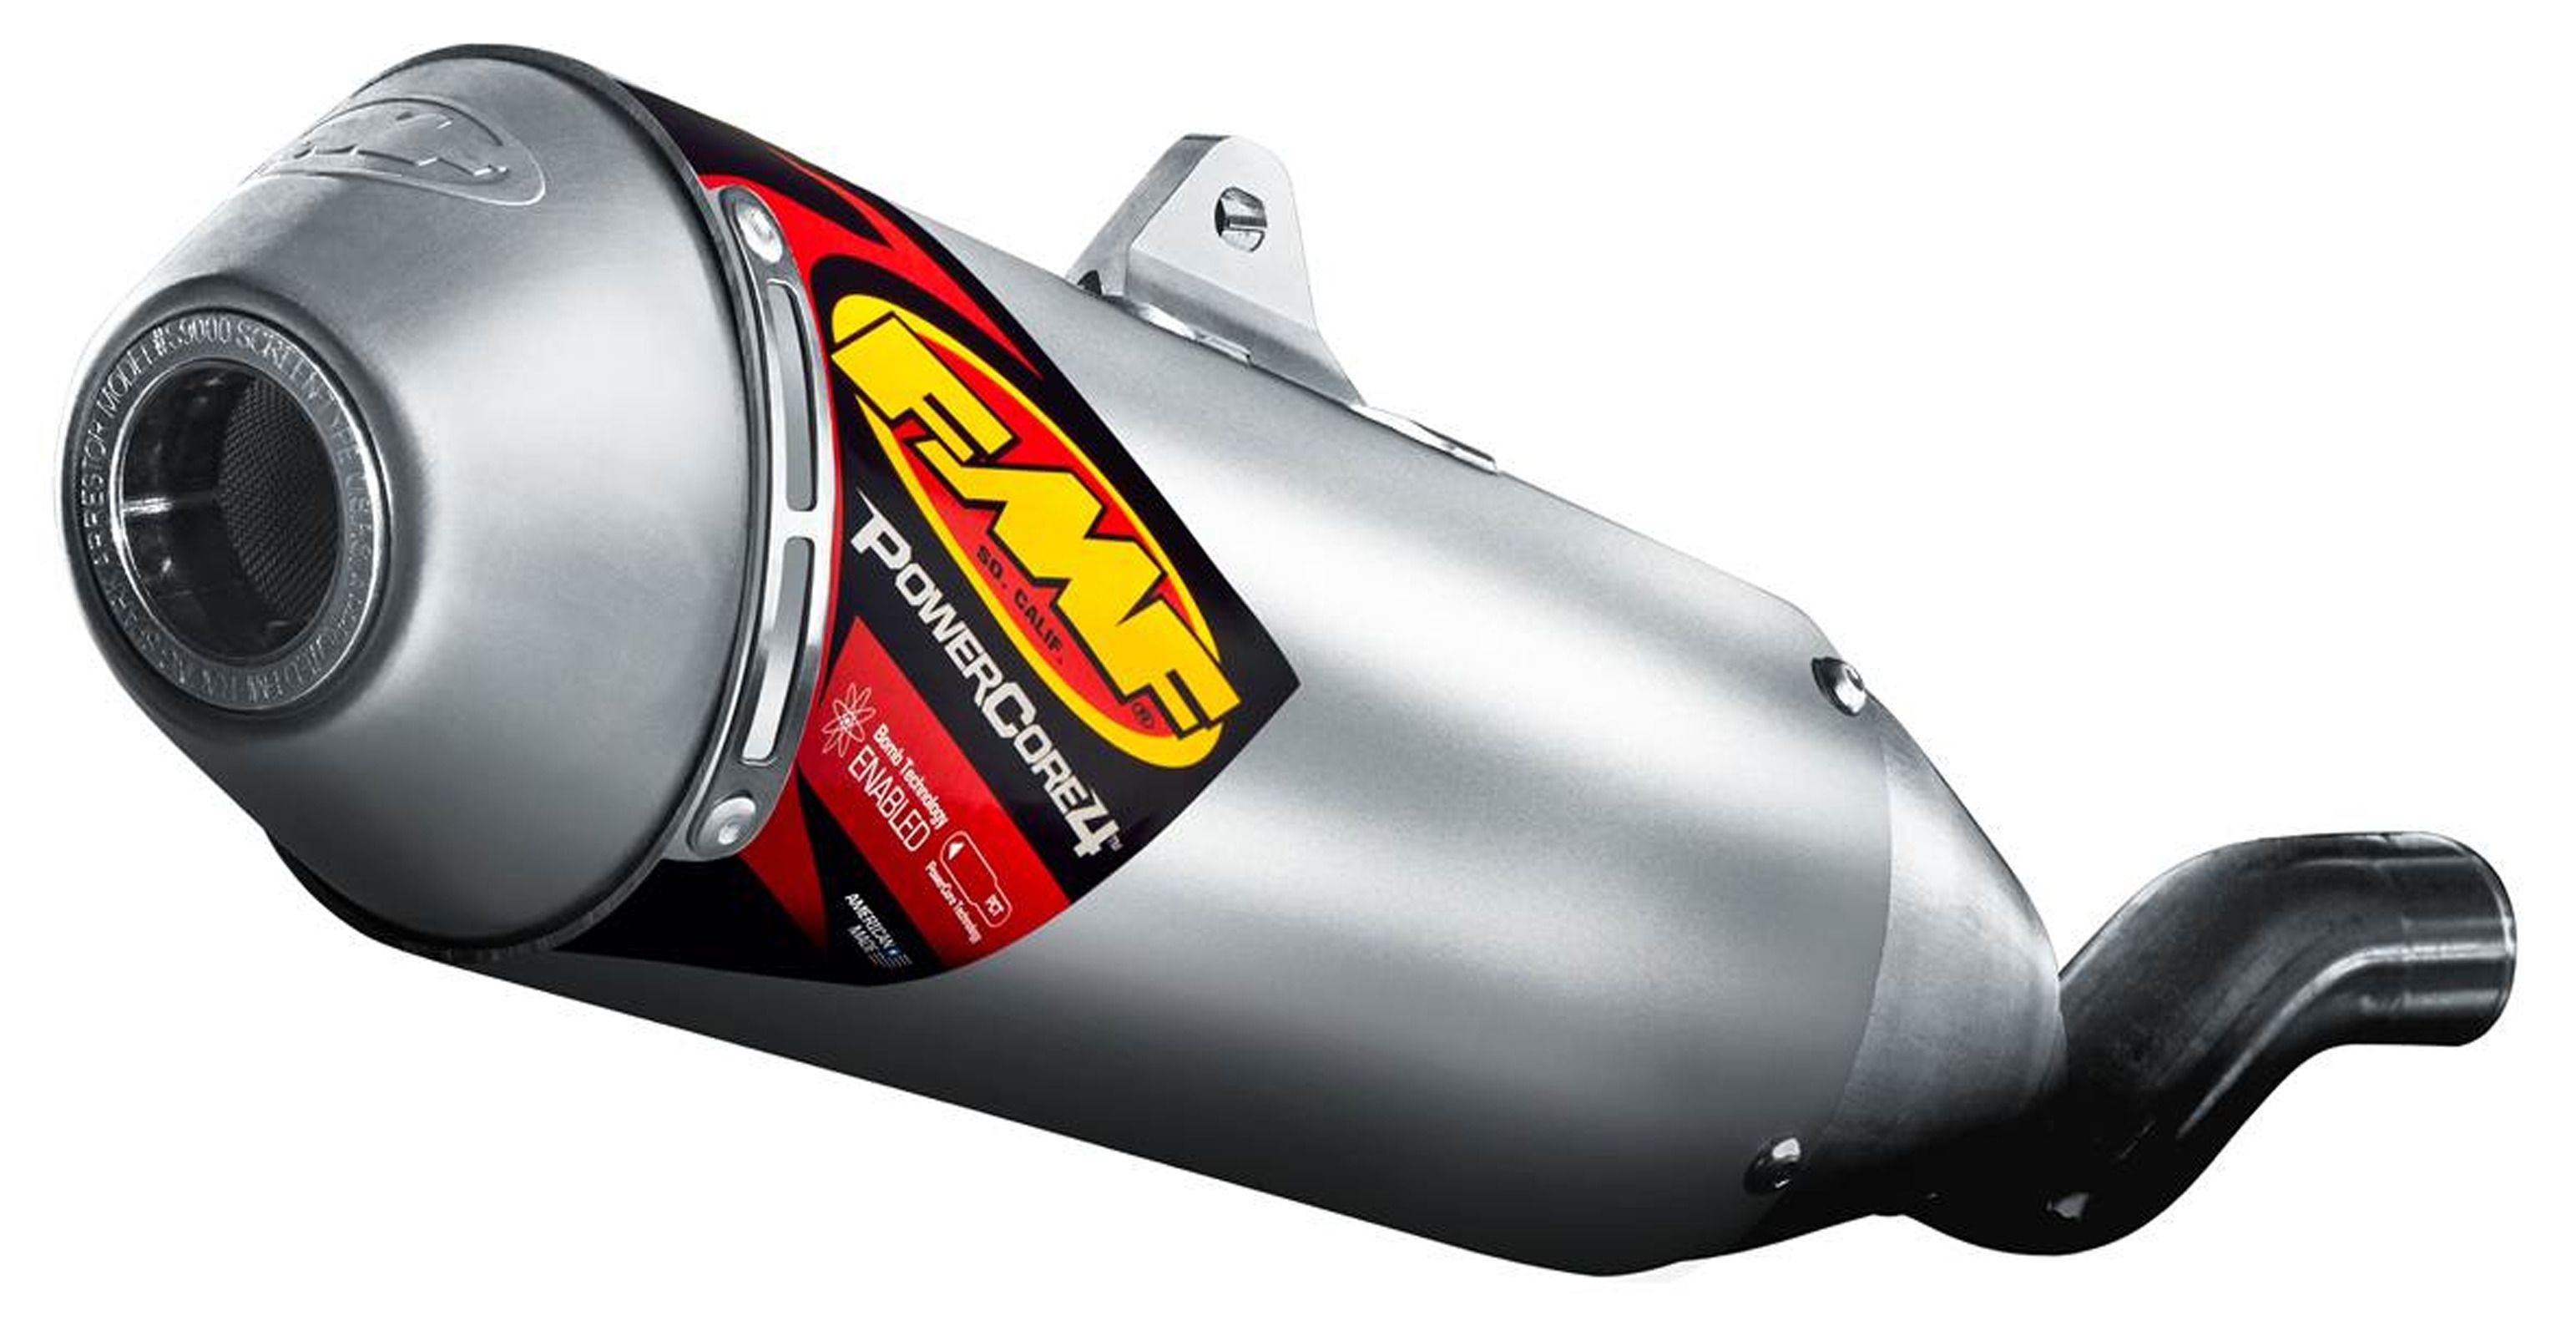 FMF PowerCore 4 Slip-On Exhaust Yamaha XT250 2008-2019 | 10% ($30 00) Off!